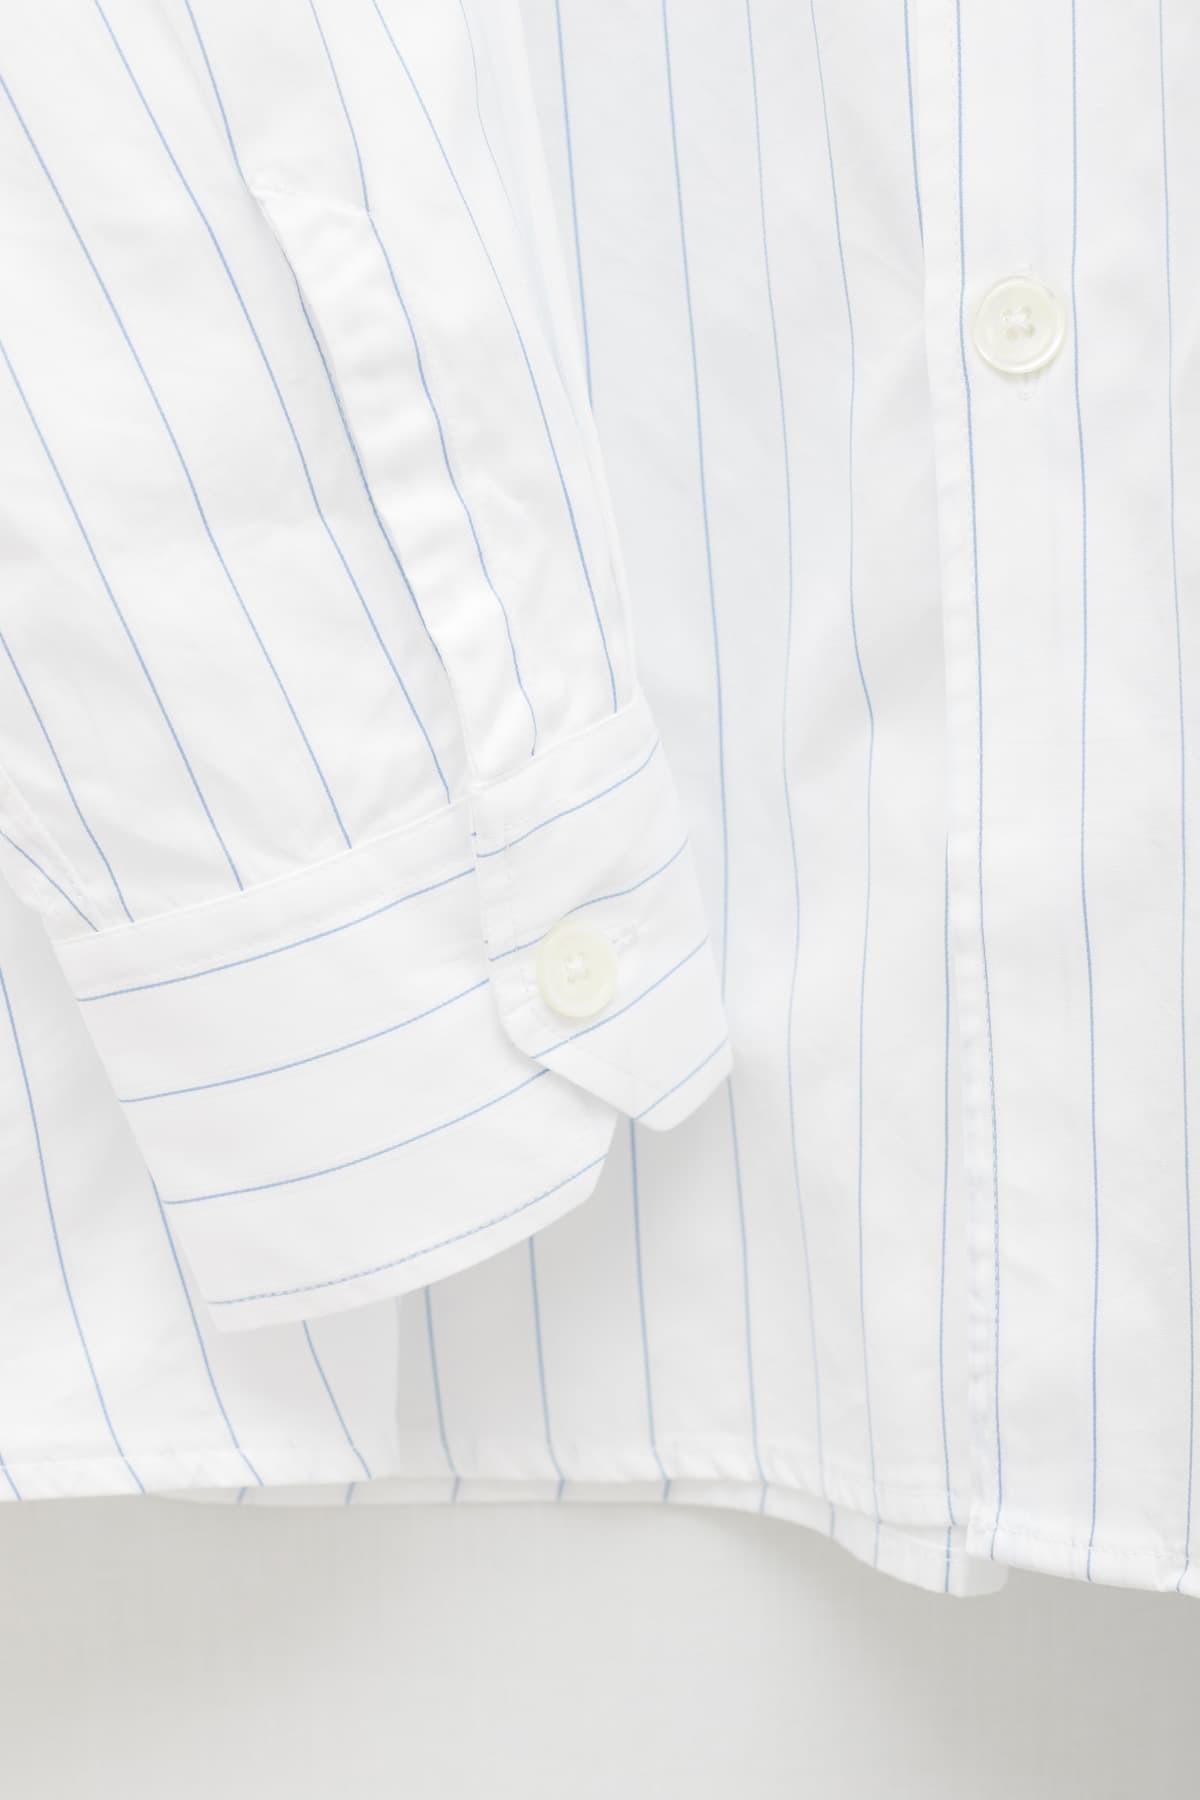 Comprar Acne Studios Pastel Pink Crewneck KNIT000278 Sweater